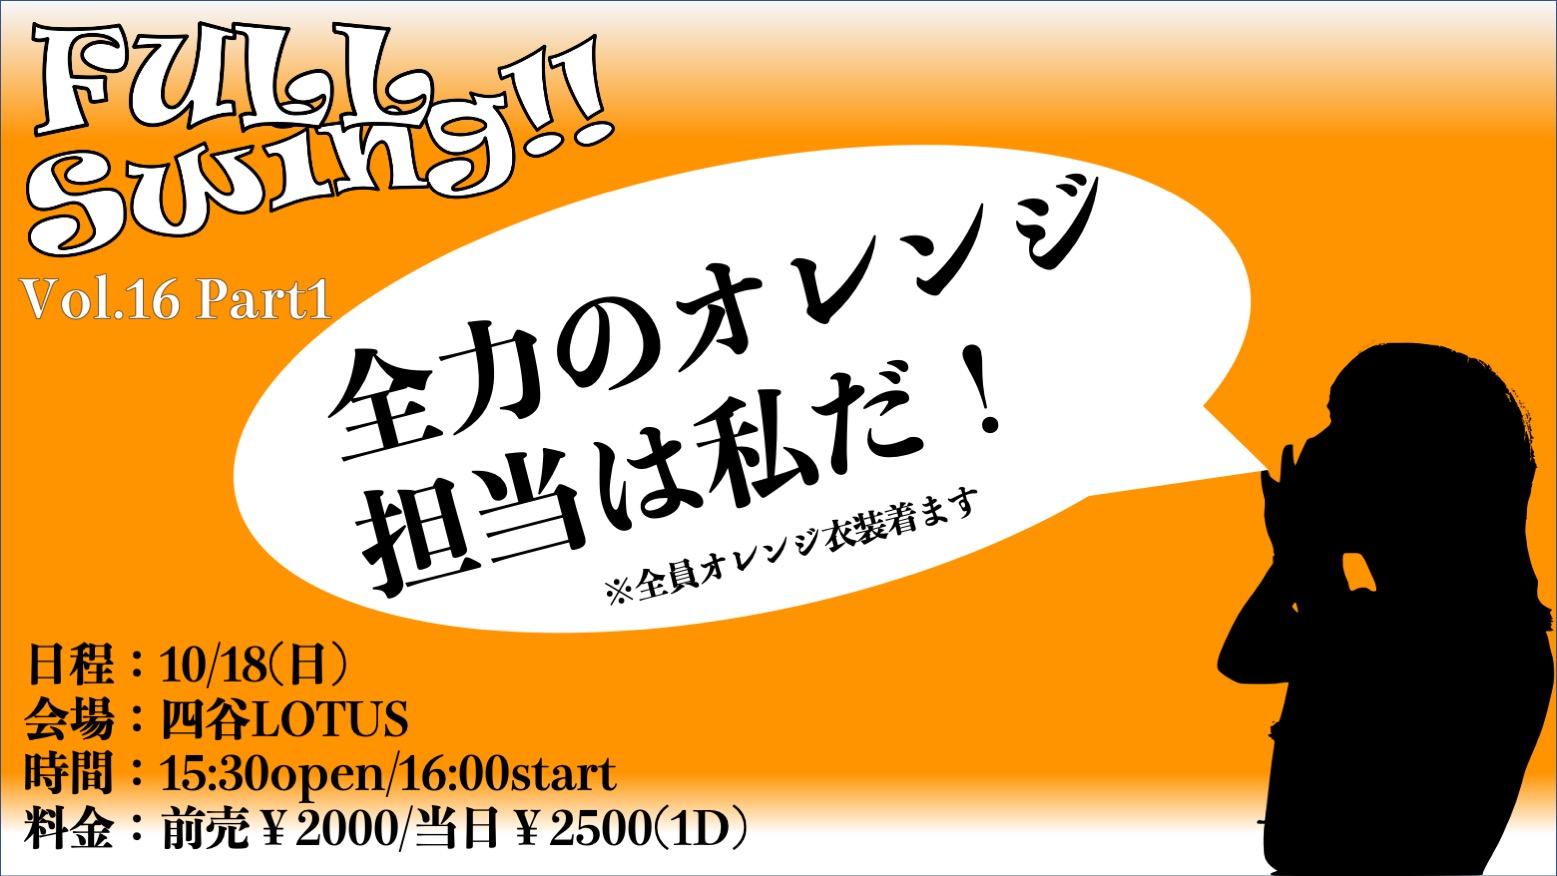 「FULLSwing!!vol.16 Part1 〜全力のオレンジ担当は私だ!〜」